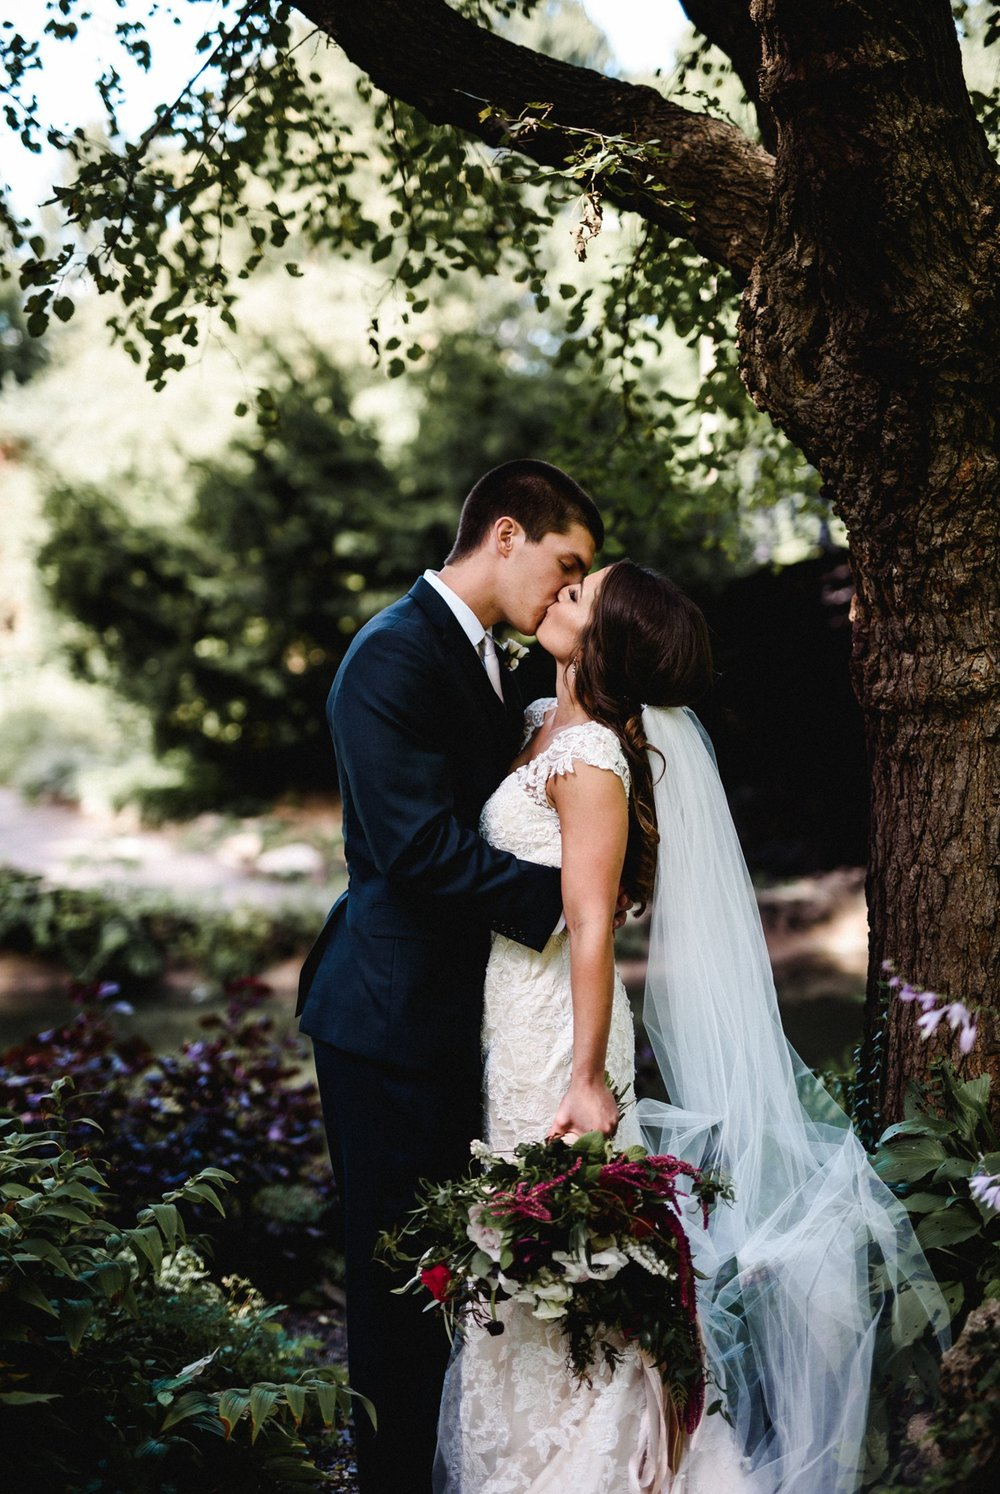 Hagan_wedding 63.jpg